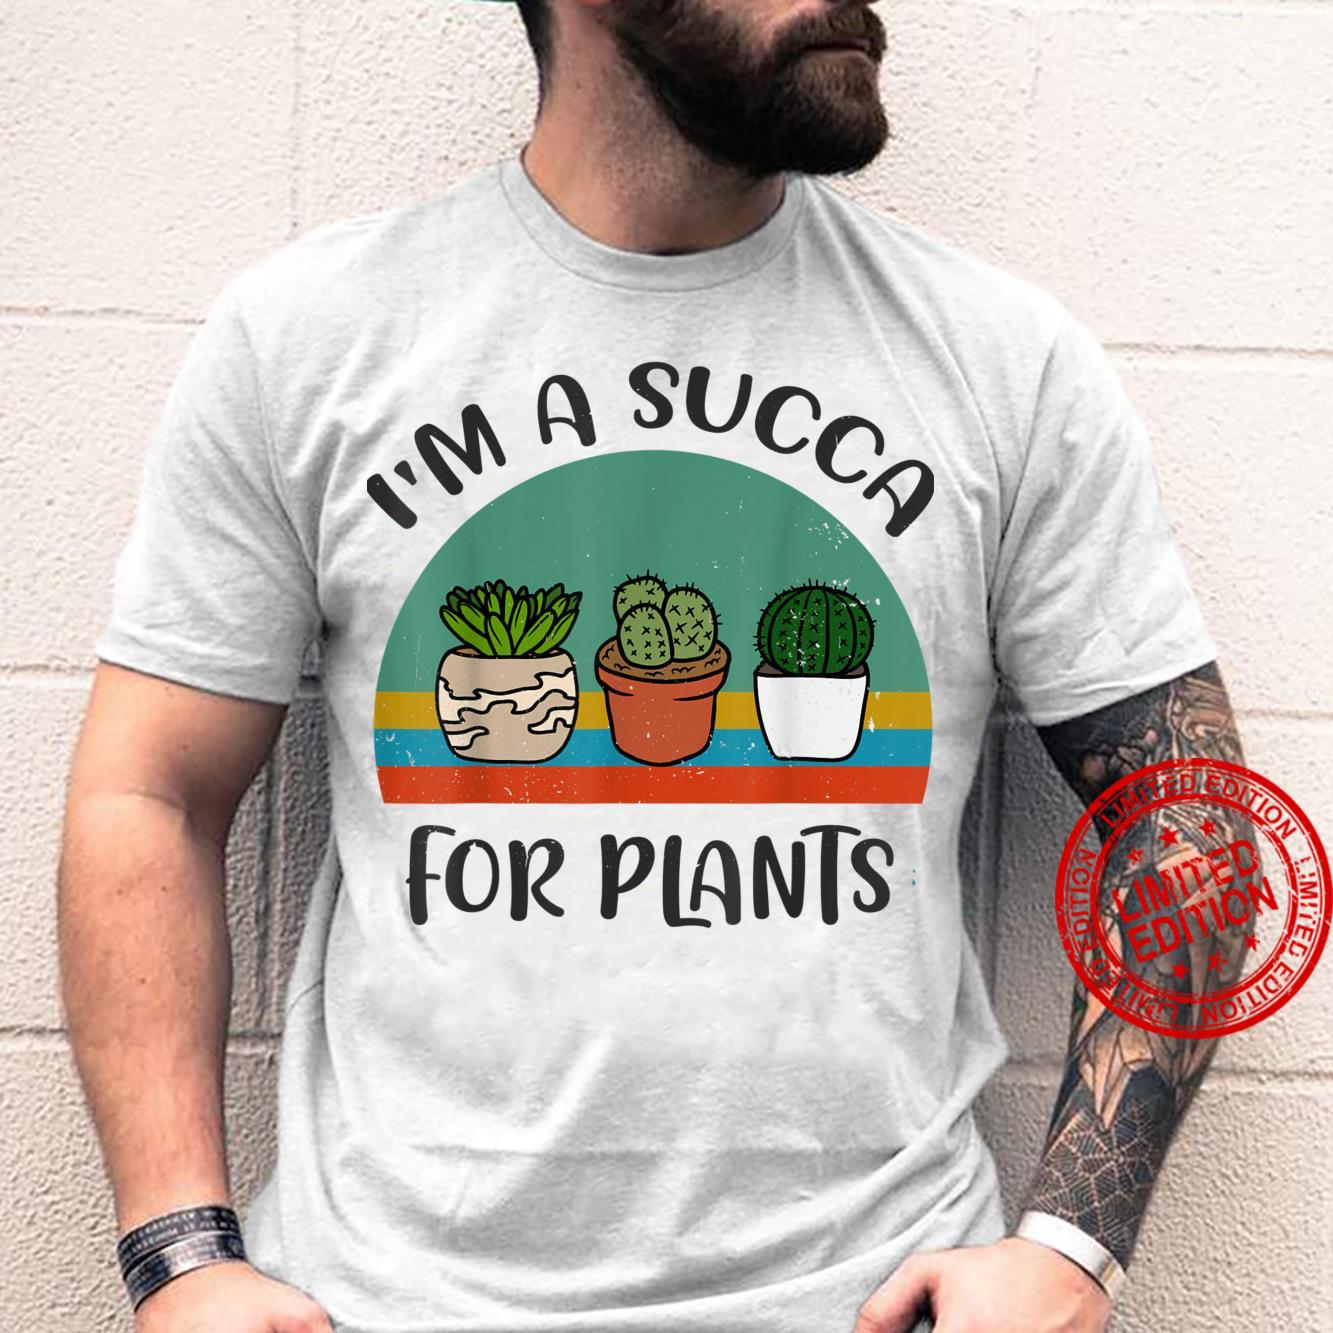 Funny Cactus I'm A Succa for Plants Succulents Garden Shirt